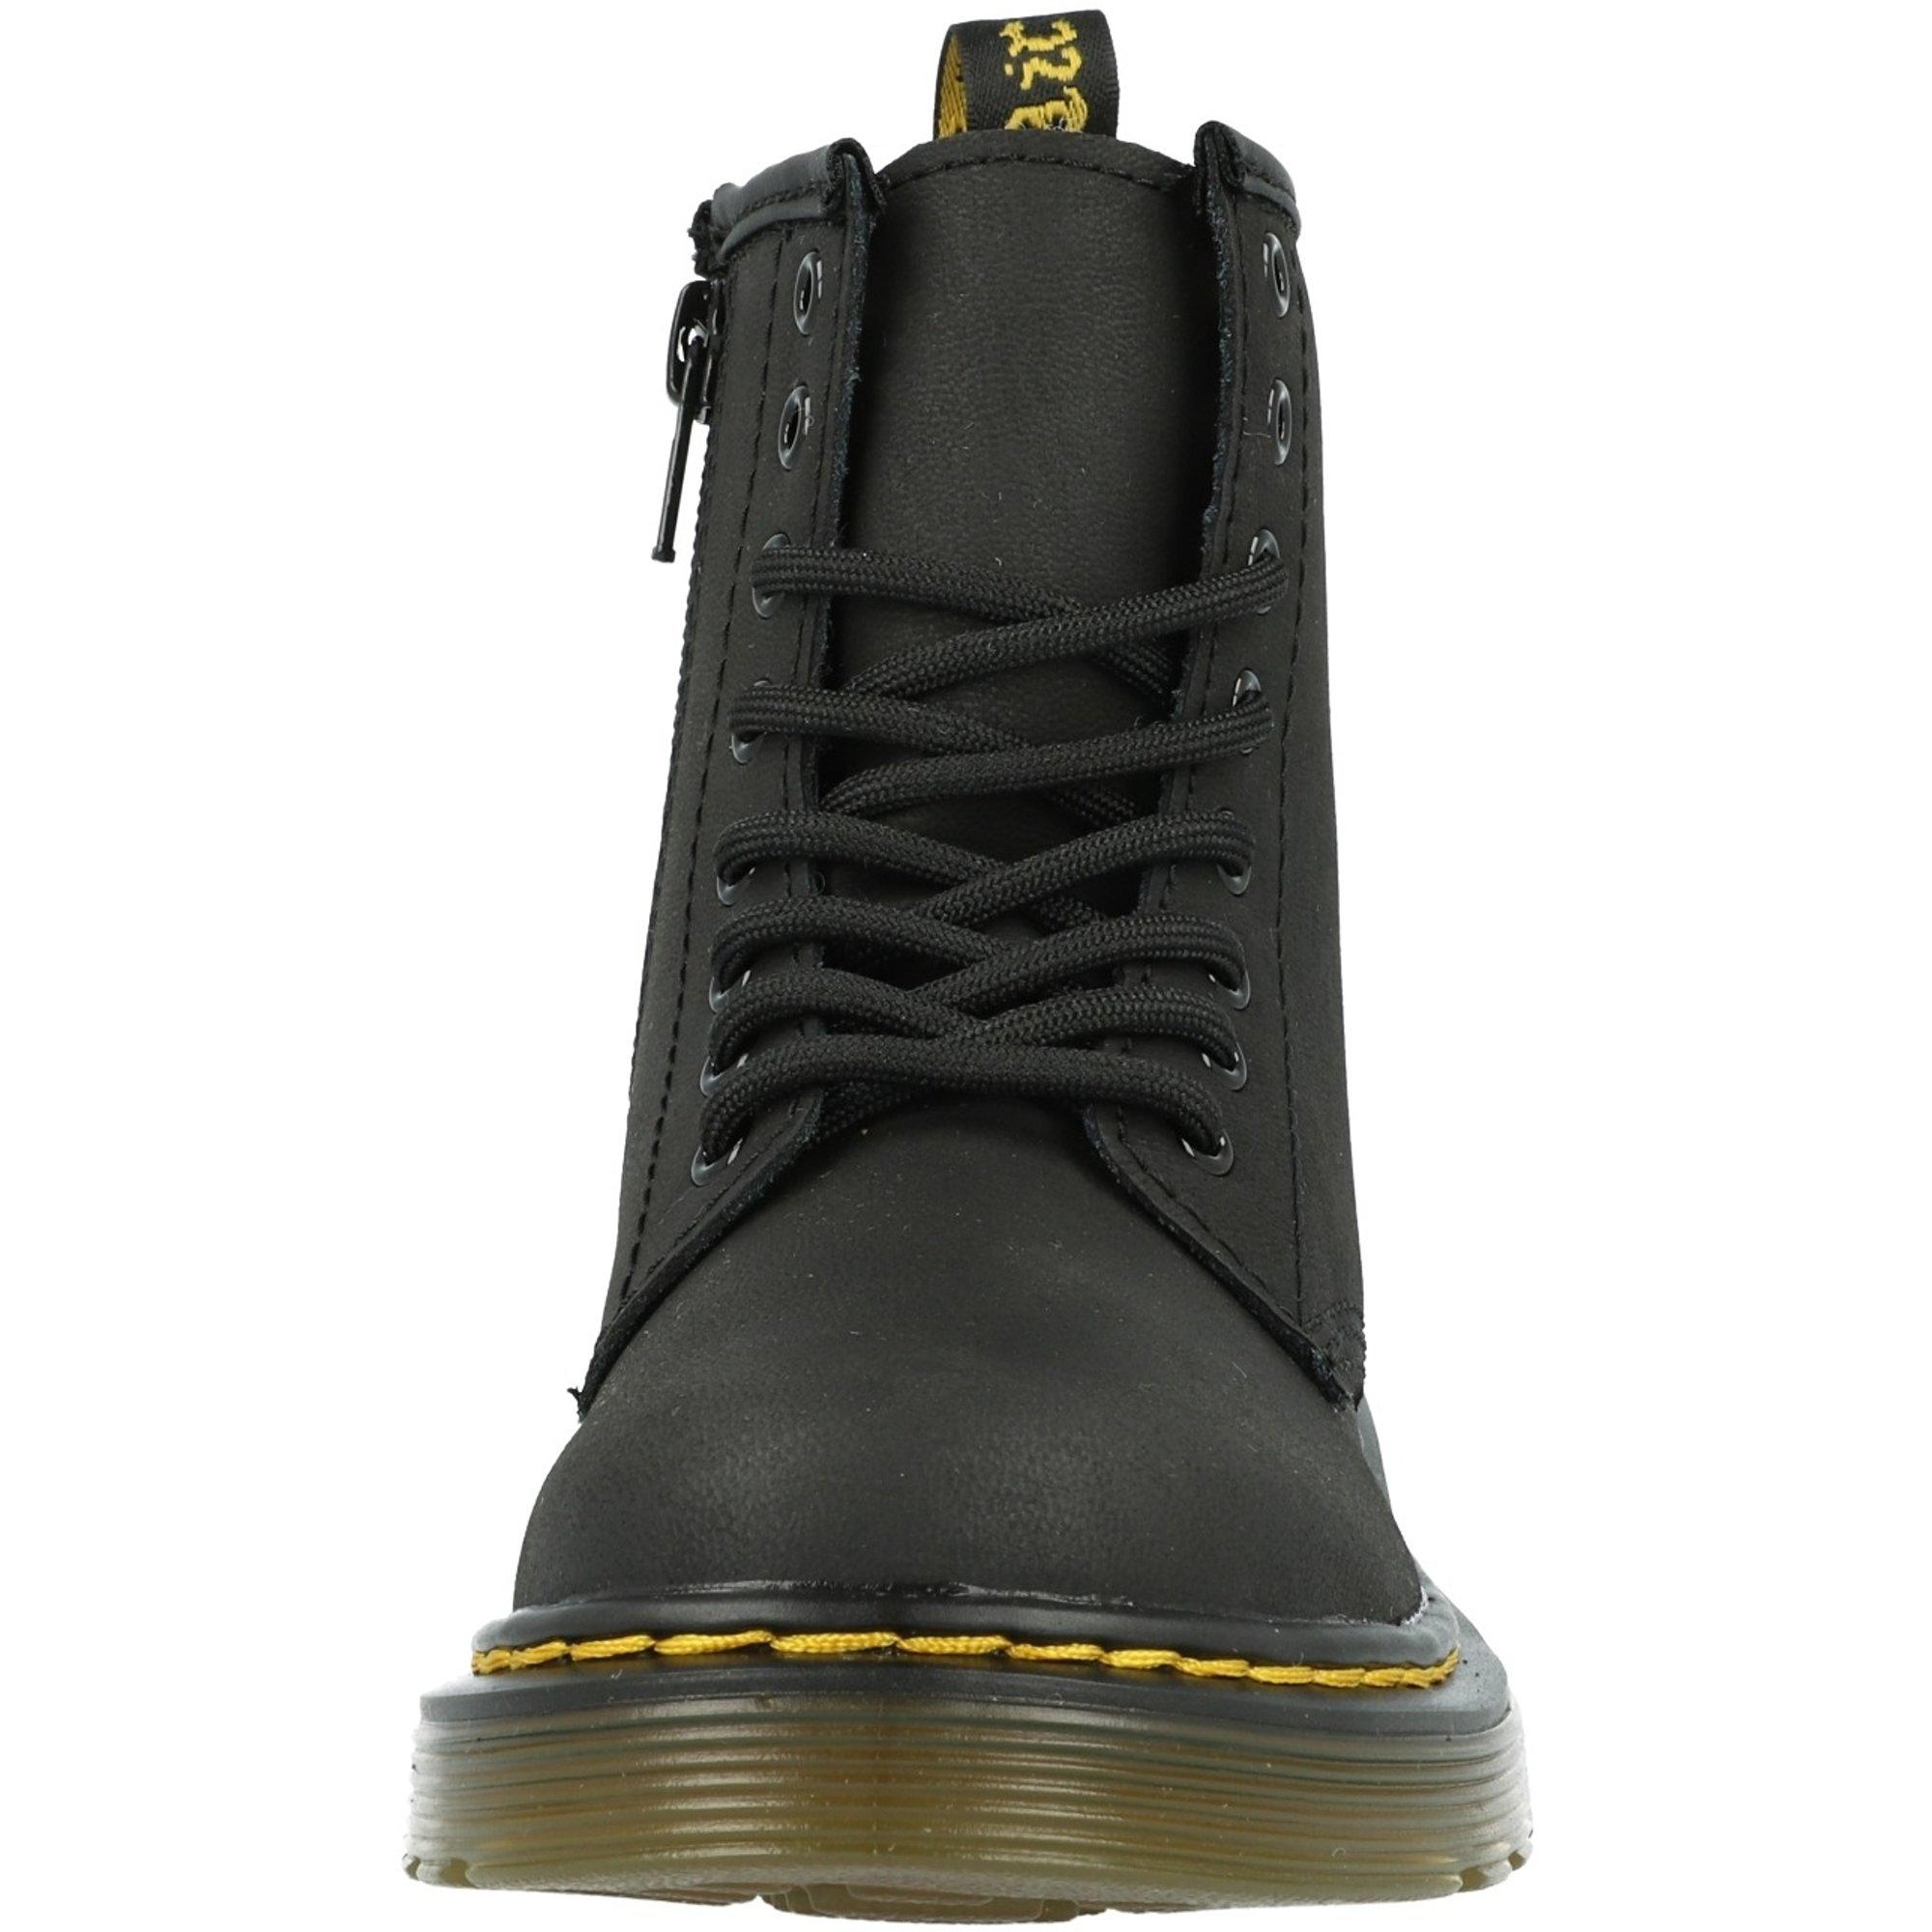 Dr.Martens SERENA 8EYE BOOTS BLACK doctor Martin selena8 hall boots black Lady's